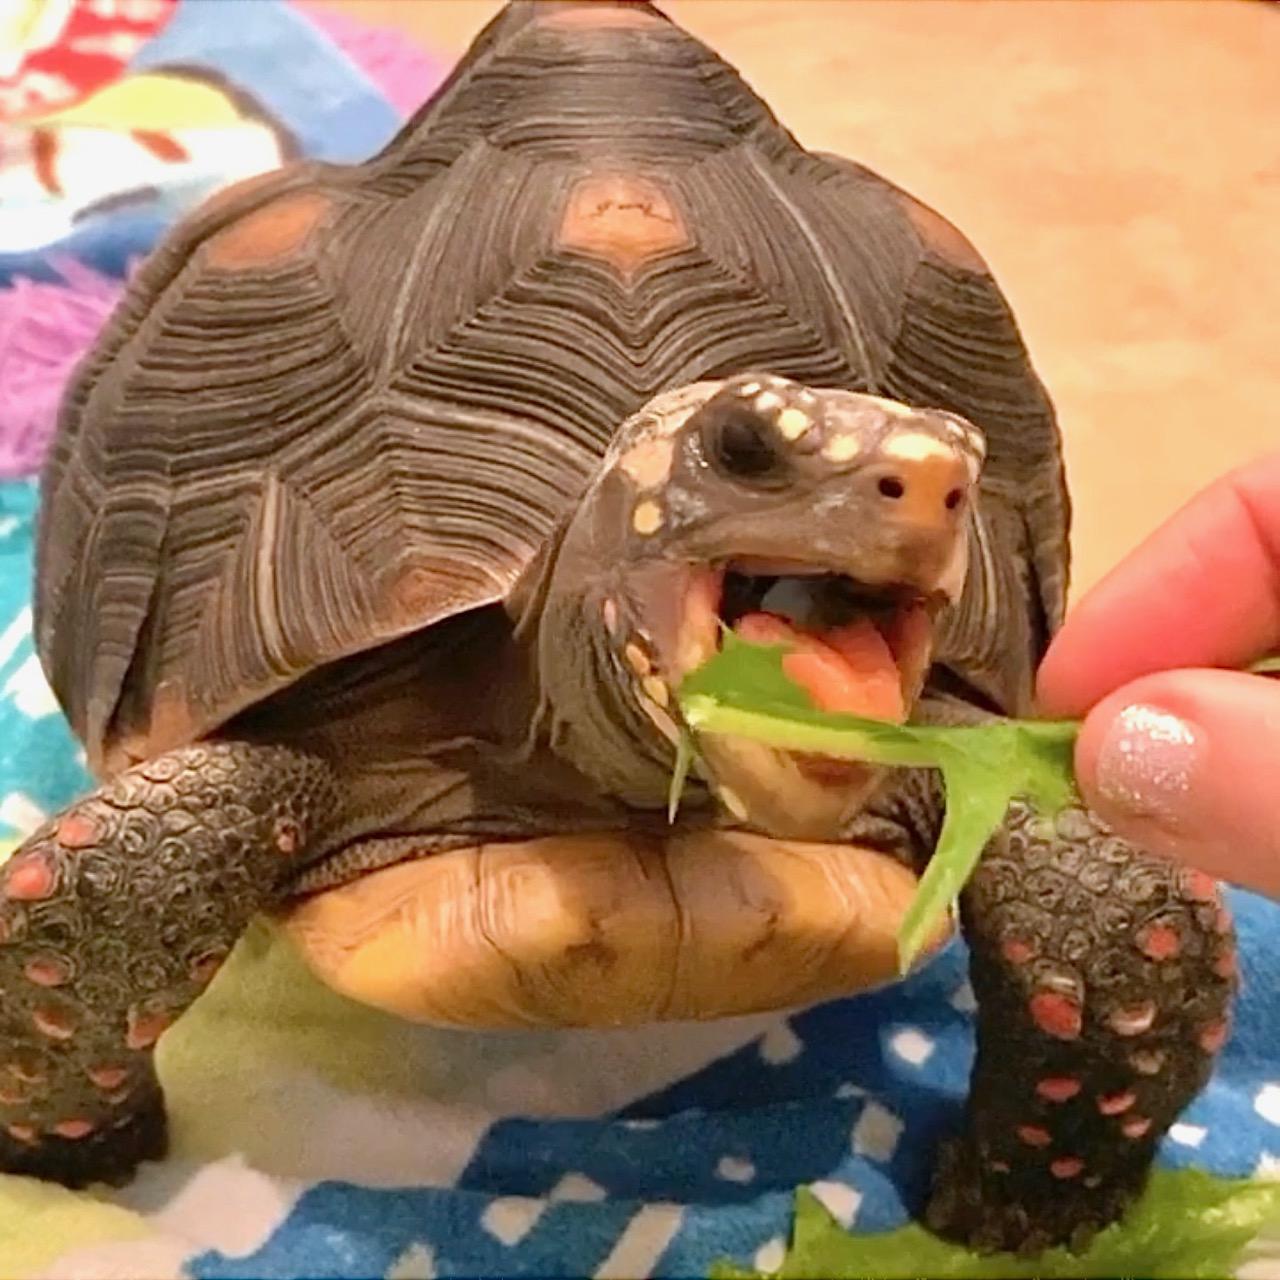 tortoise eats dandelion greens